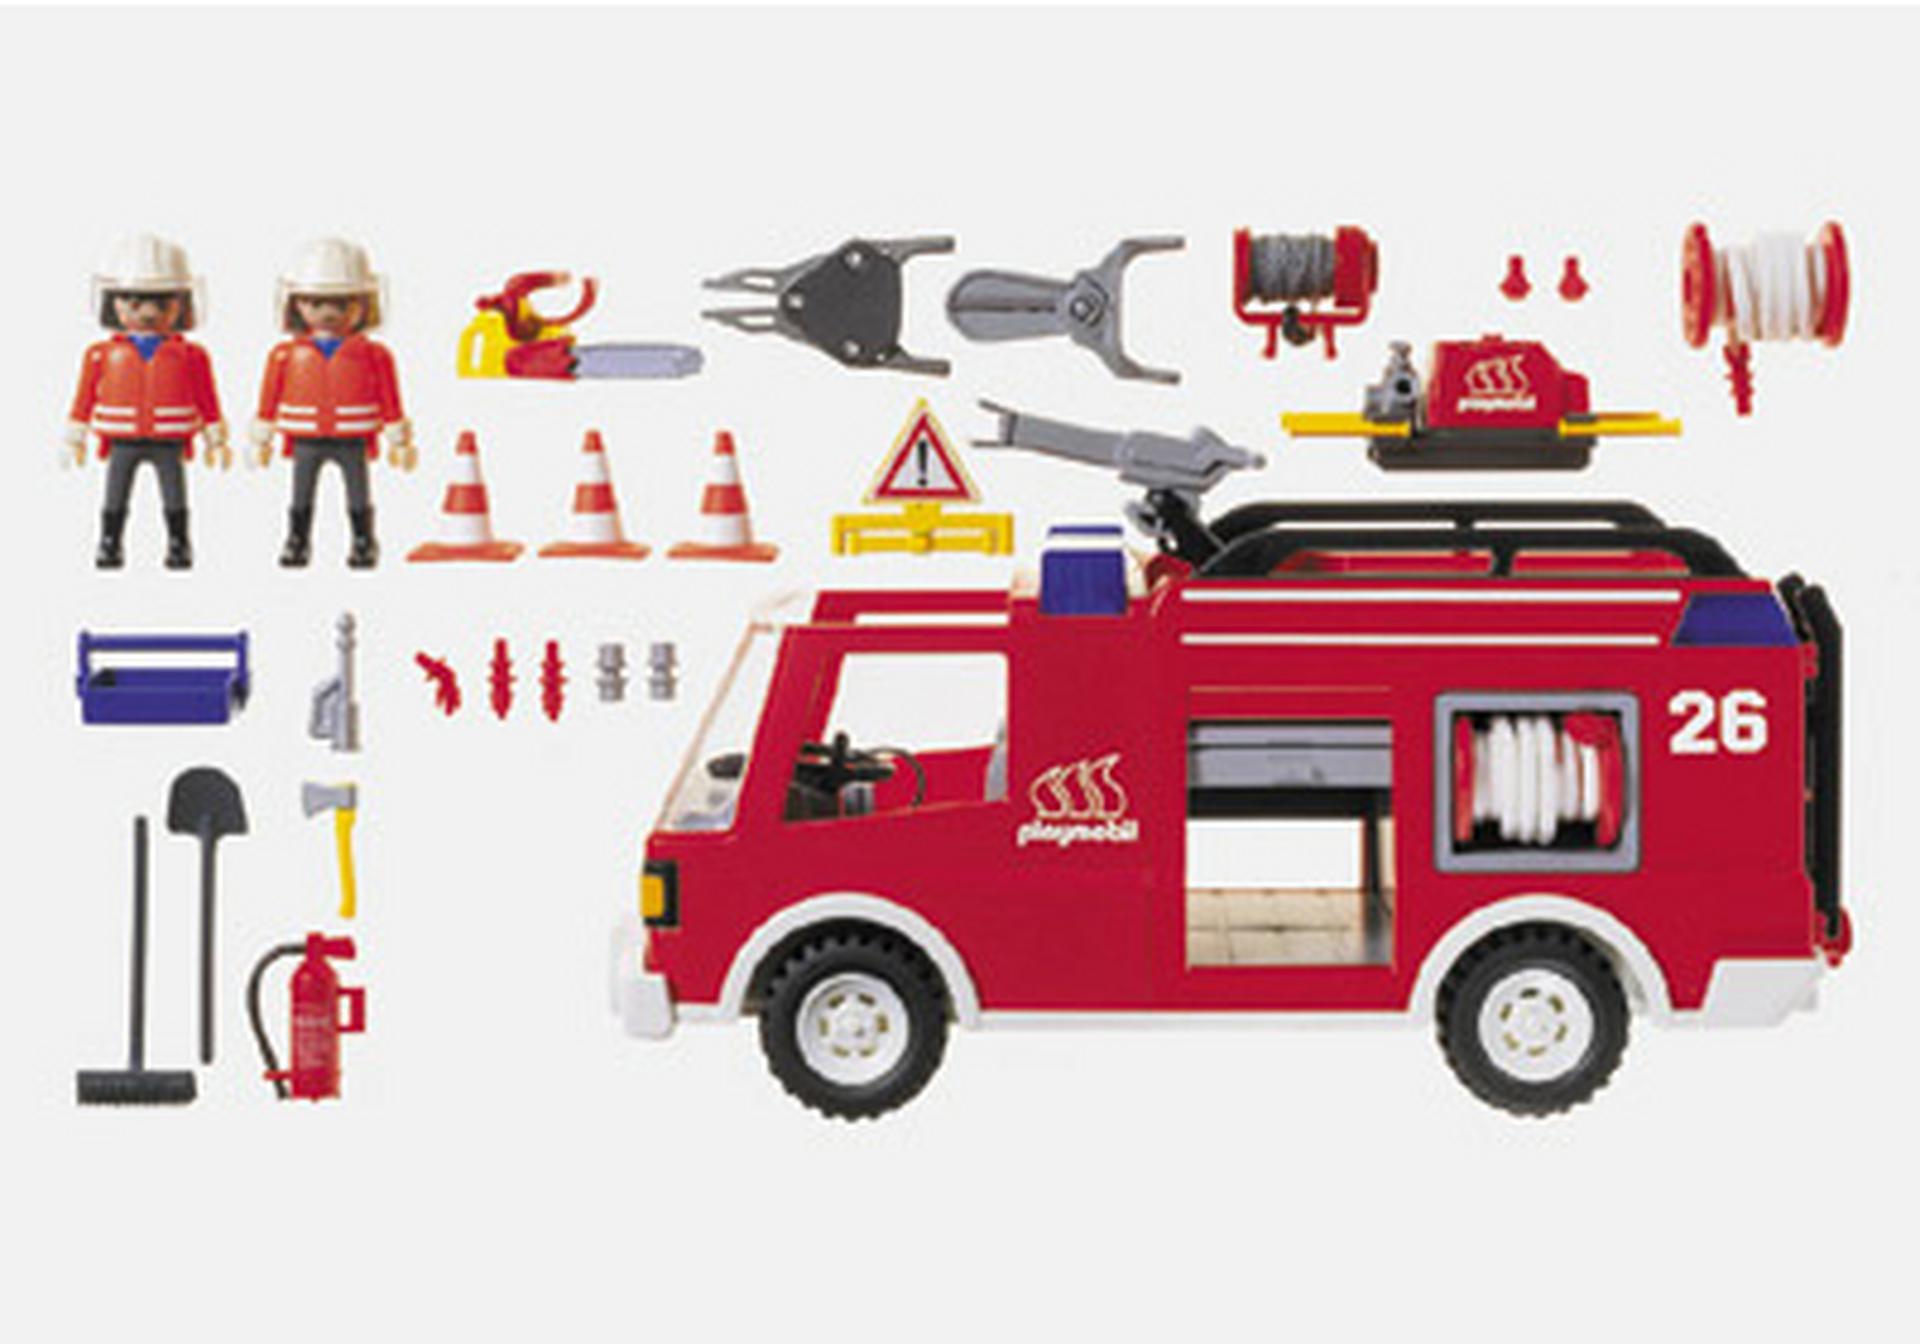 pompiers camion lance eau 3880 a playmobil france. Black Bedroom Furniture Sets. Home Design Ideas